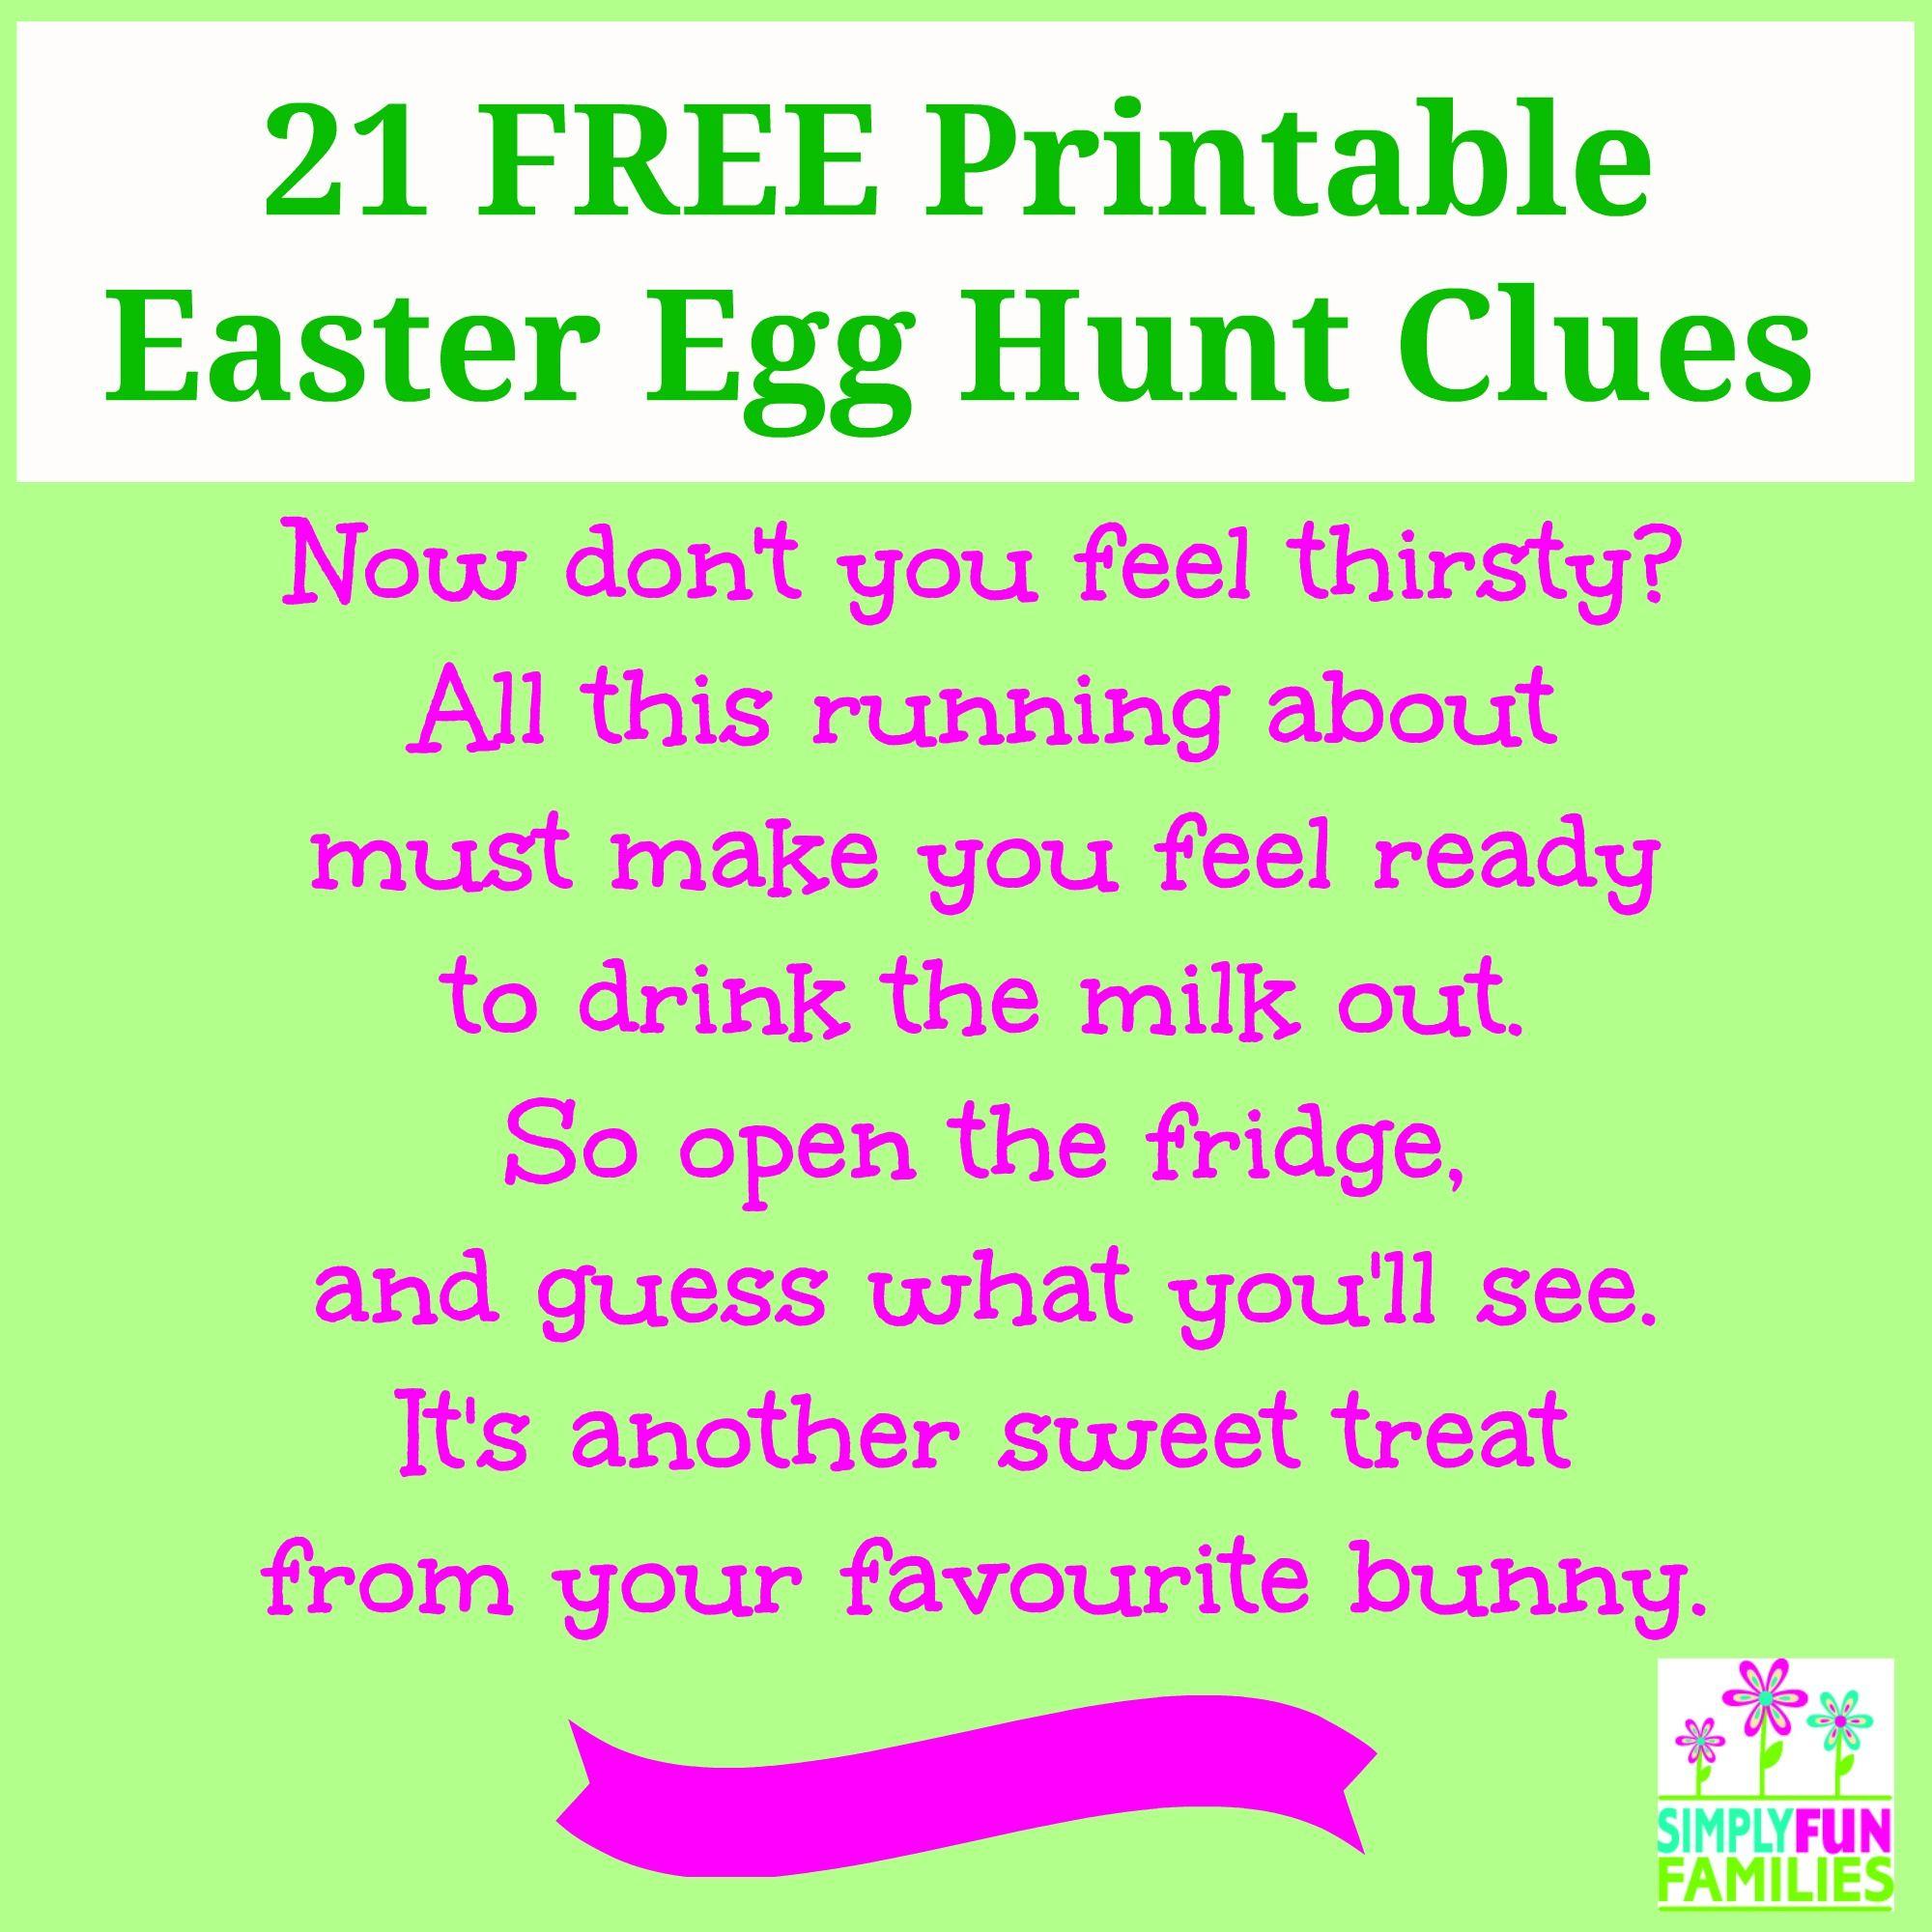 Nifty image regarding printable easter egg hunt clues